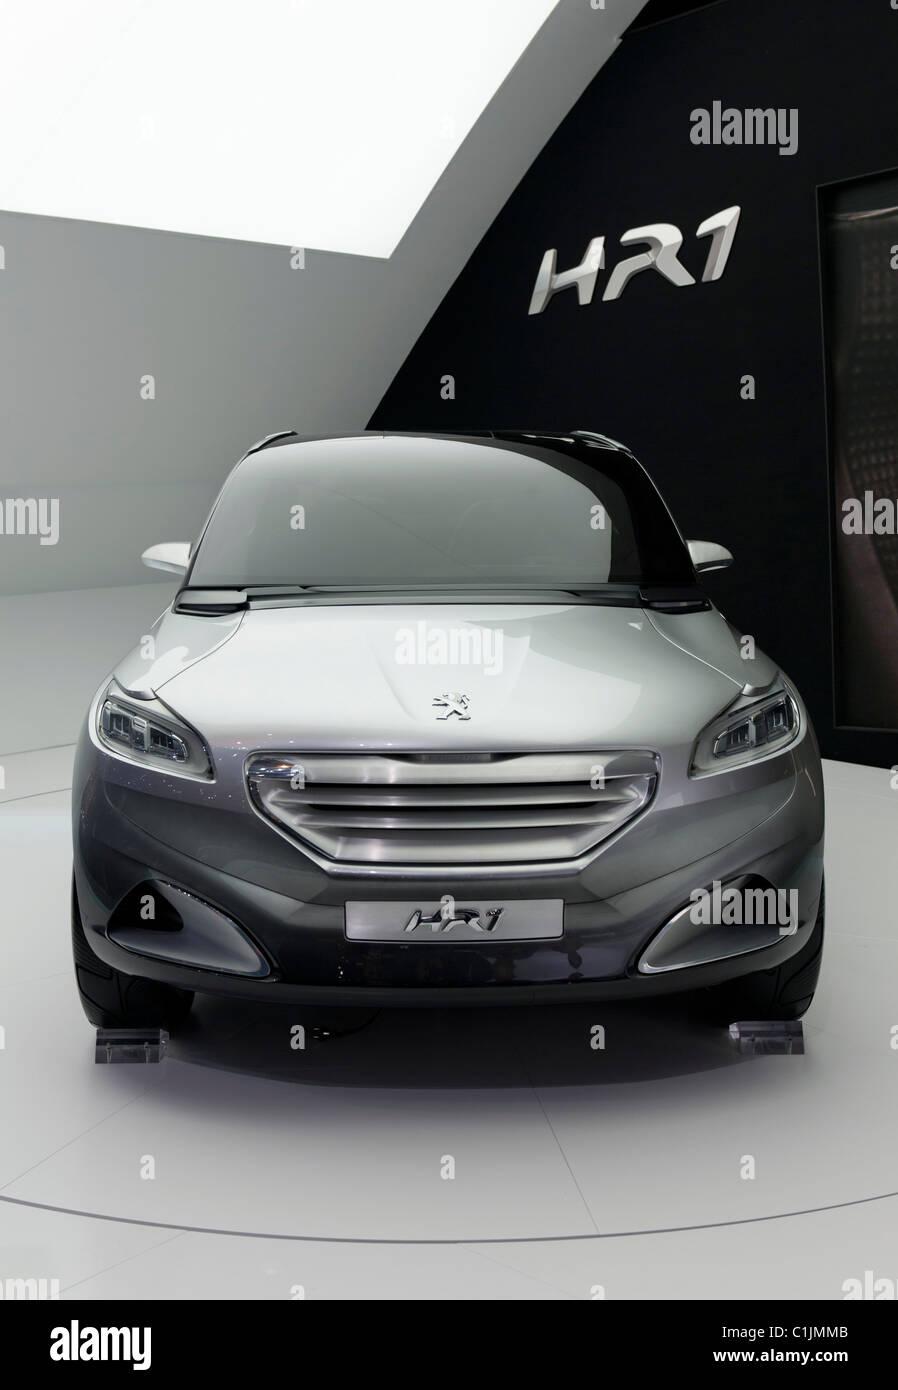 Peugeot HR1 concept Hybrid petrol concept car at the Geneva Motor Show 2011 Switzerland - Stock Image